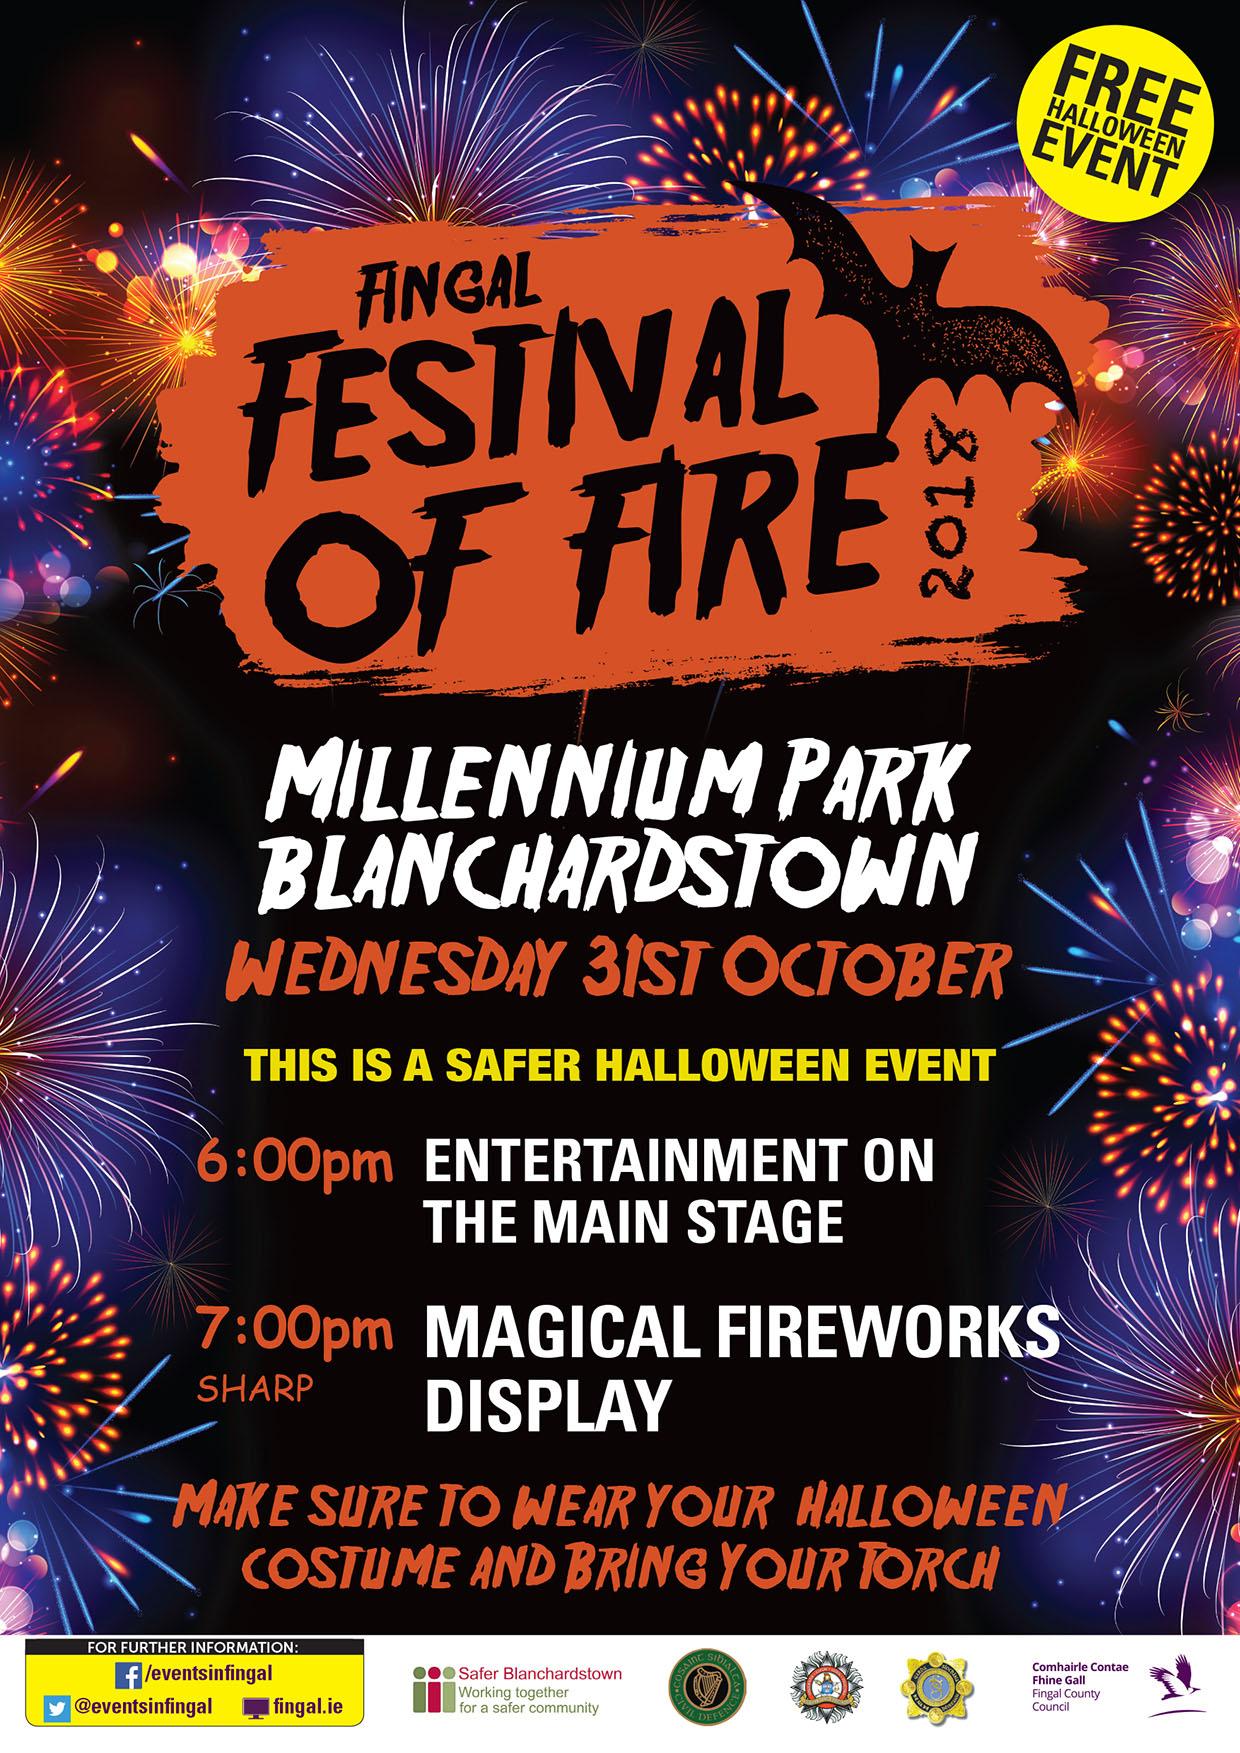 Fingal Festival of Fire